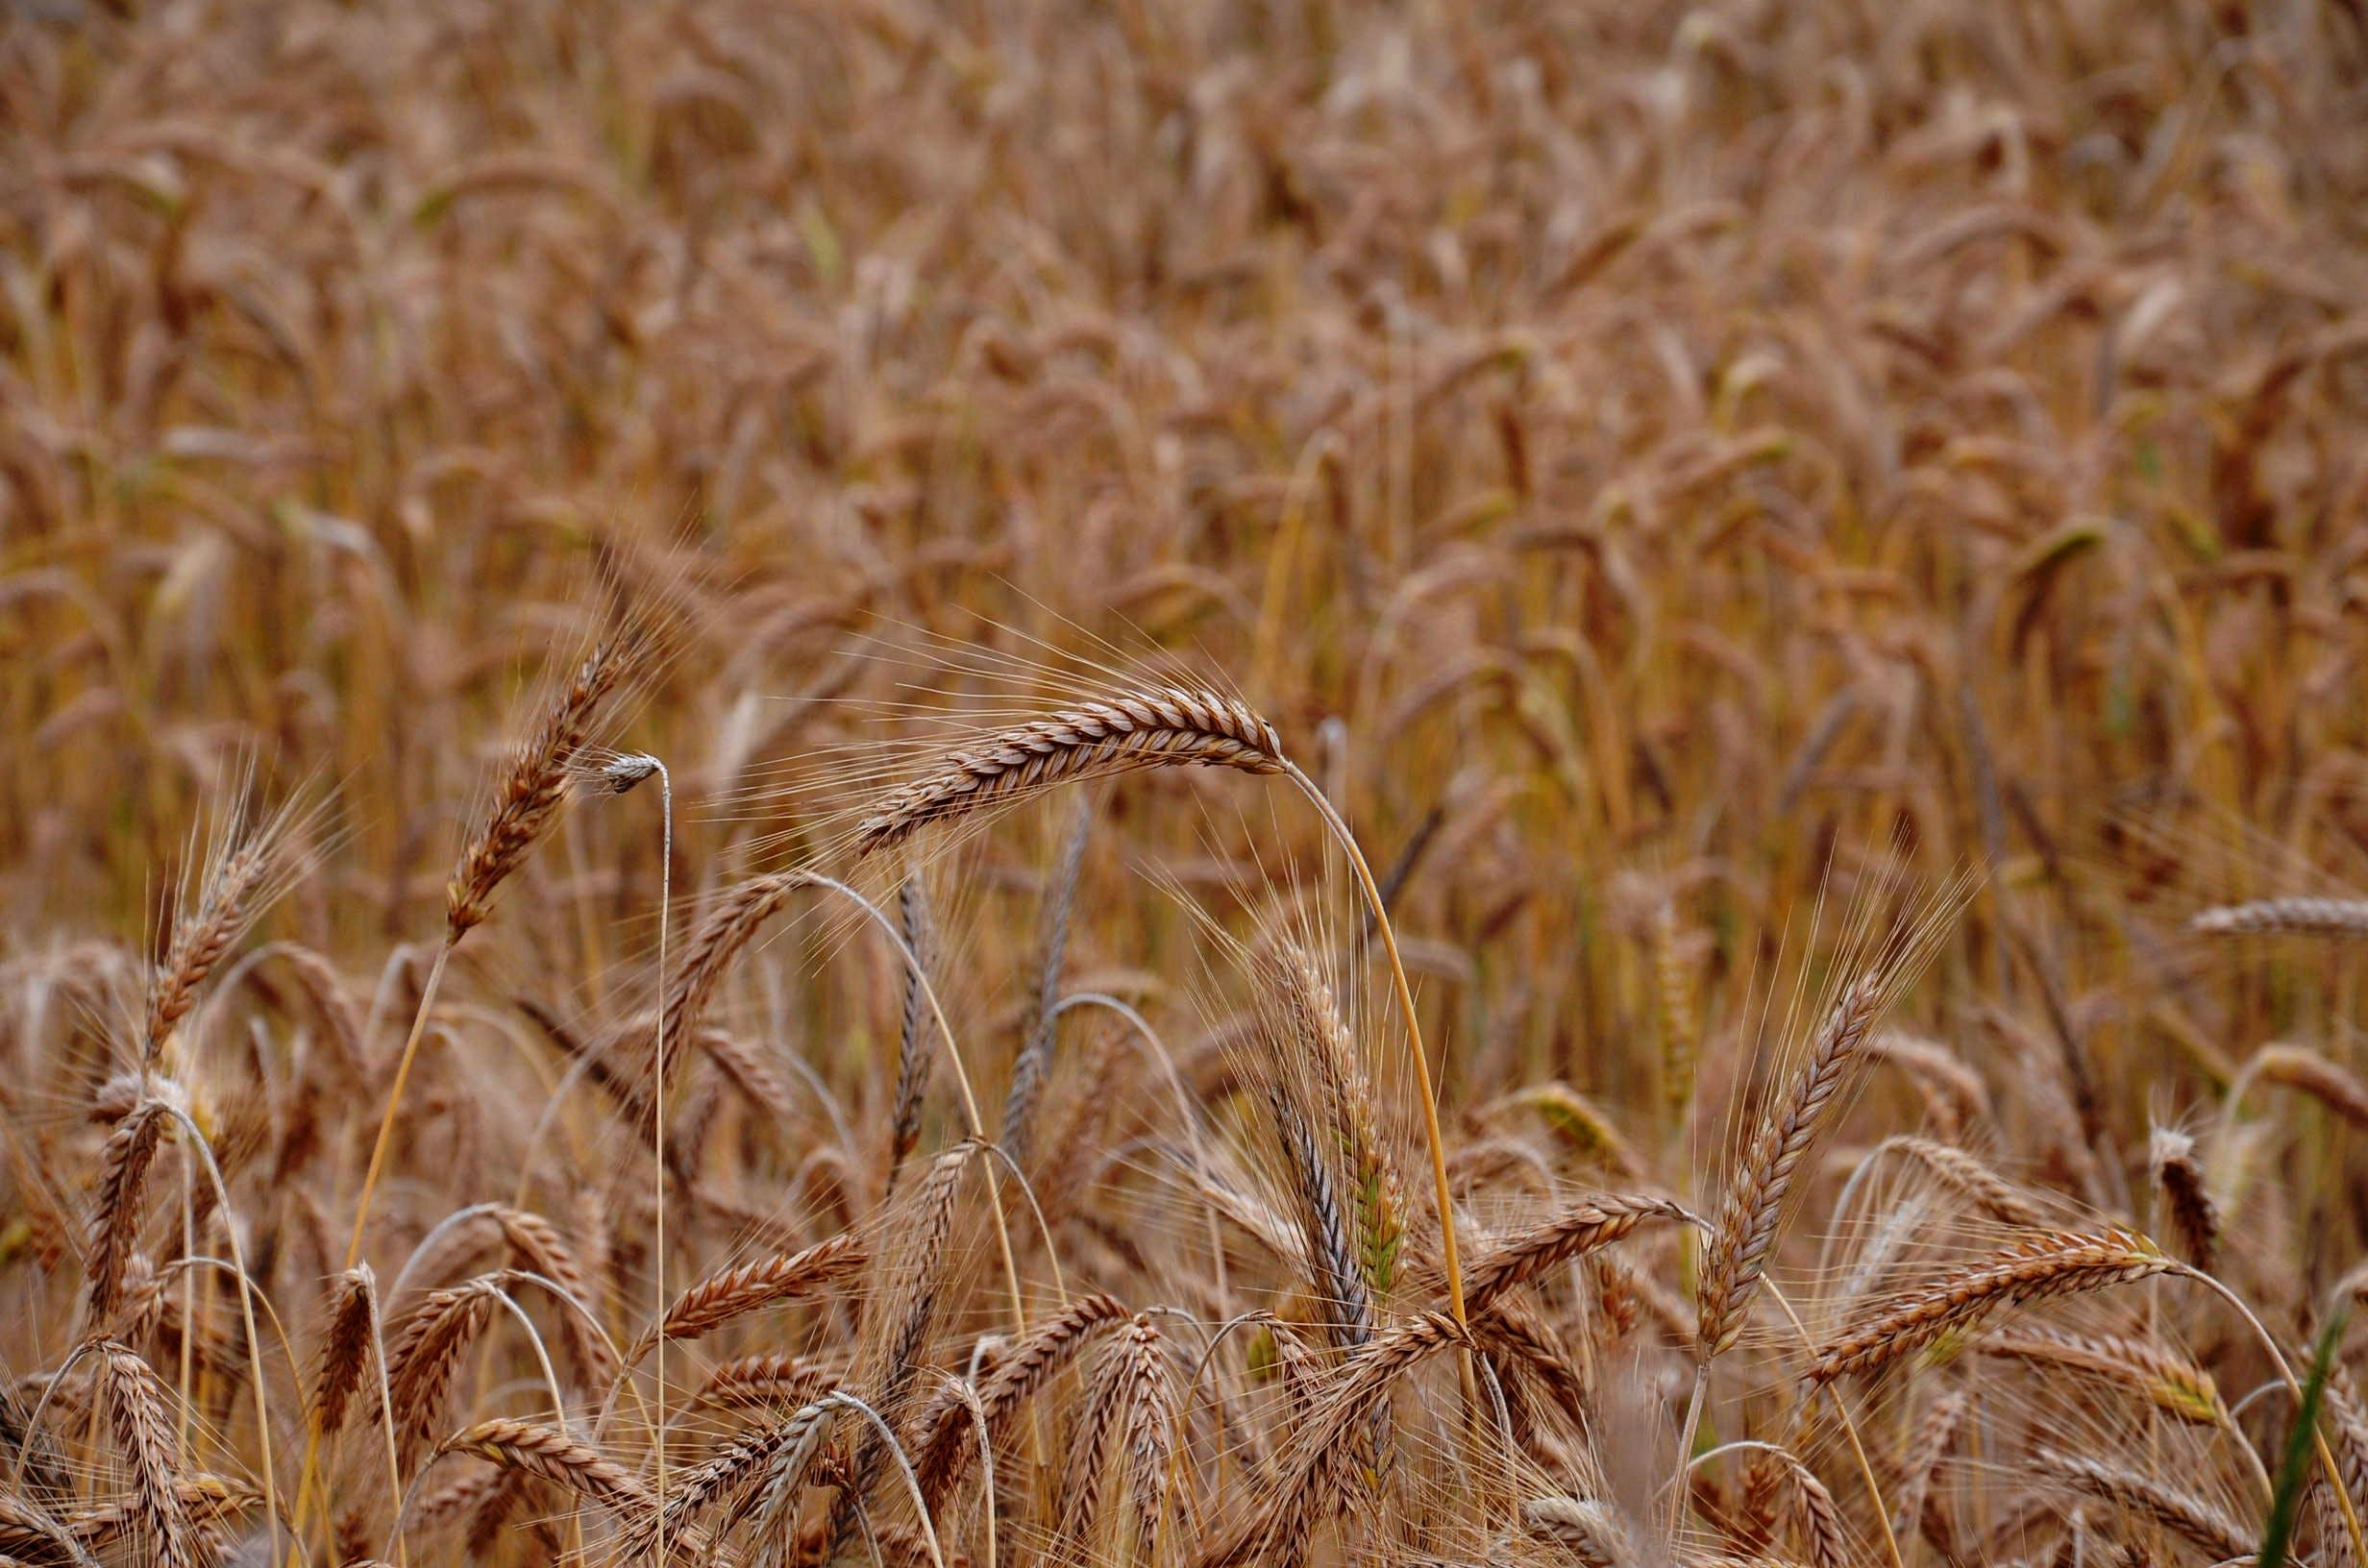 Closeup Photo of Brown Wheat Plants